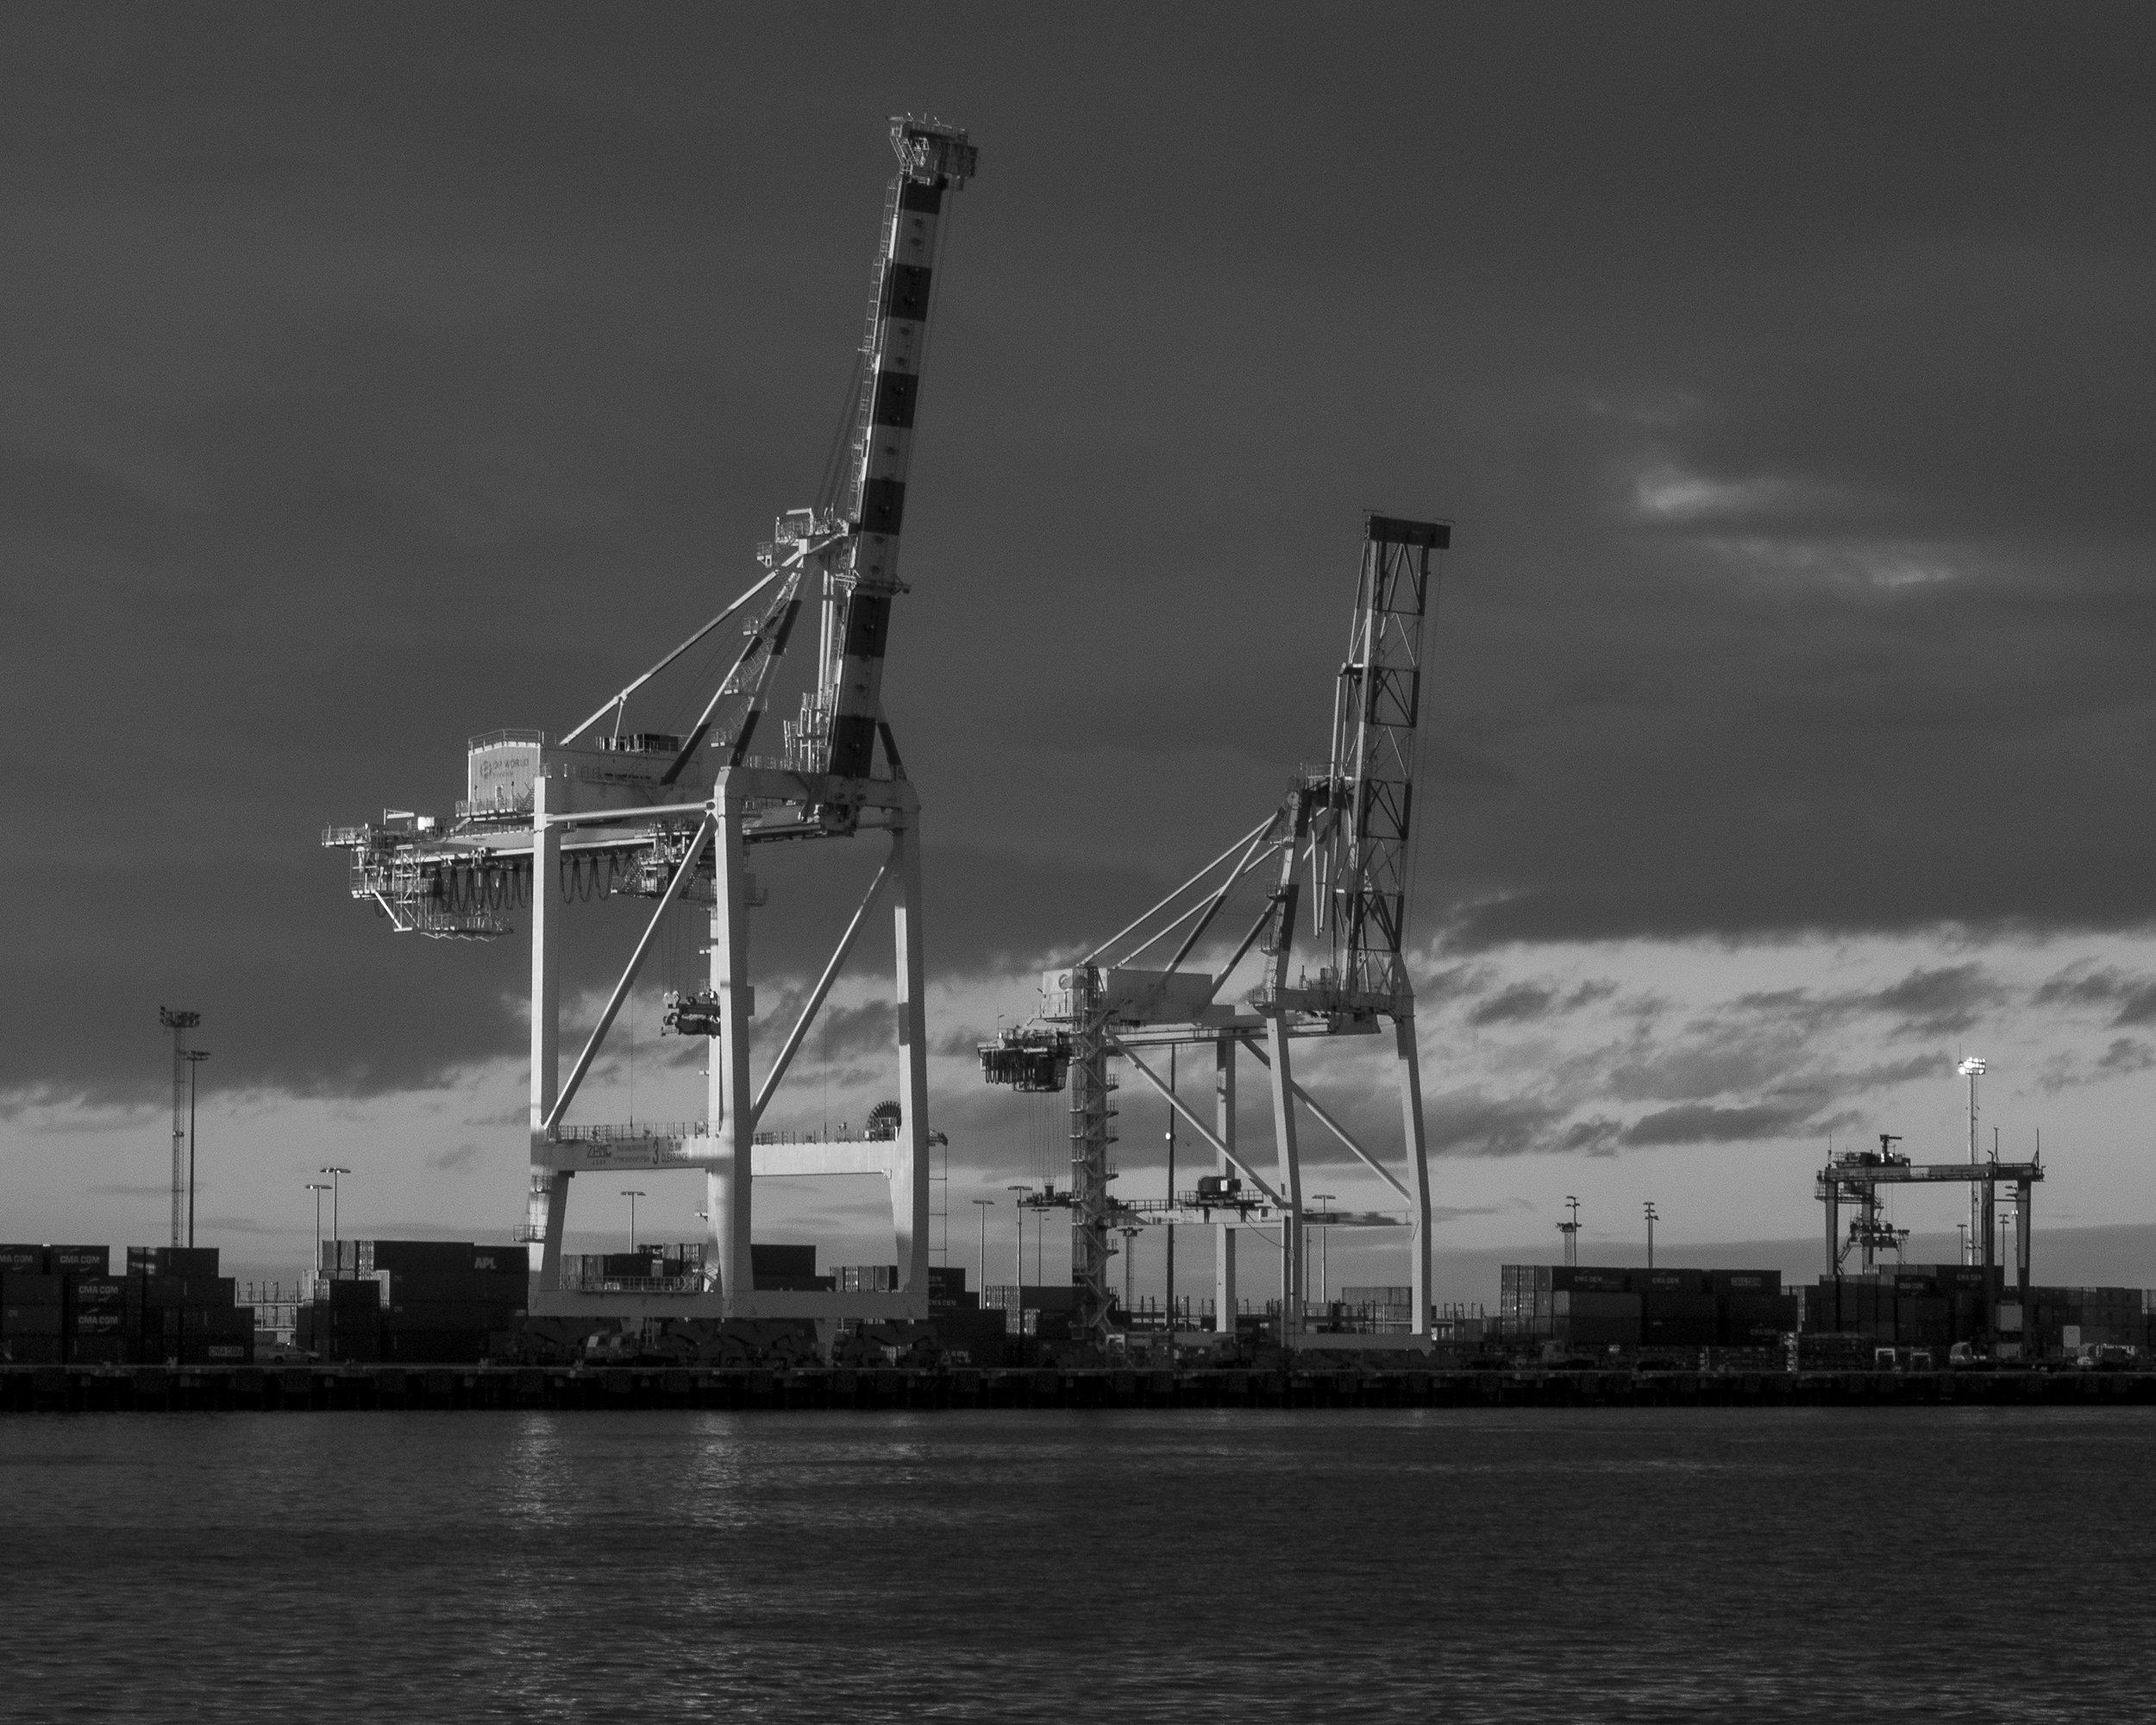 OVERVIEWINSIGHTORCHESTRATE - like giraffes and port logistics